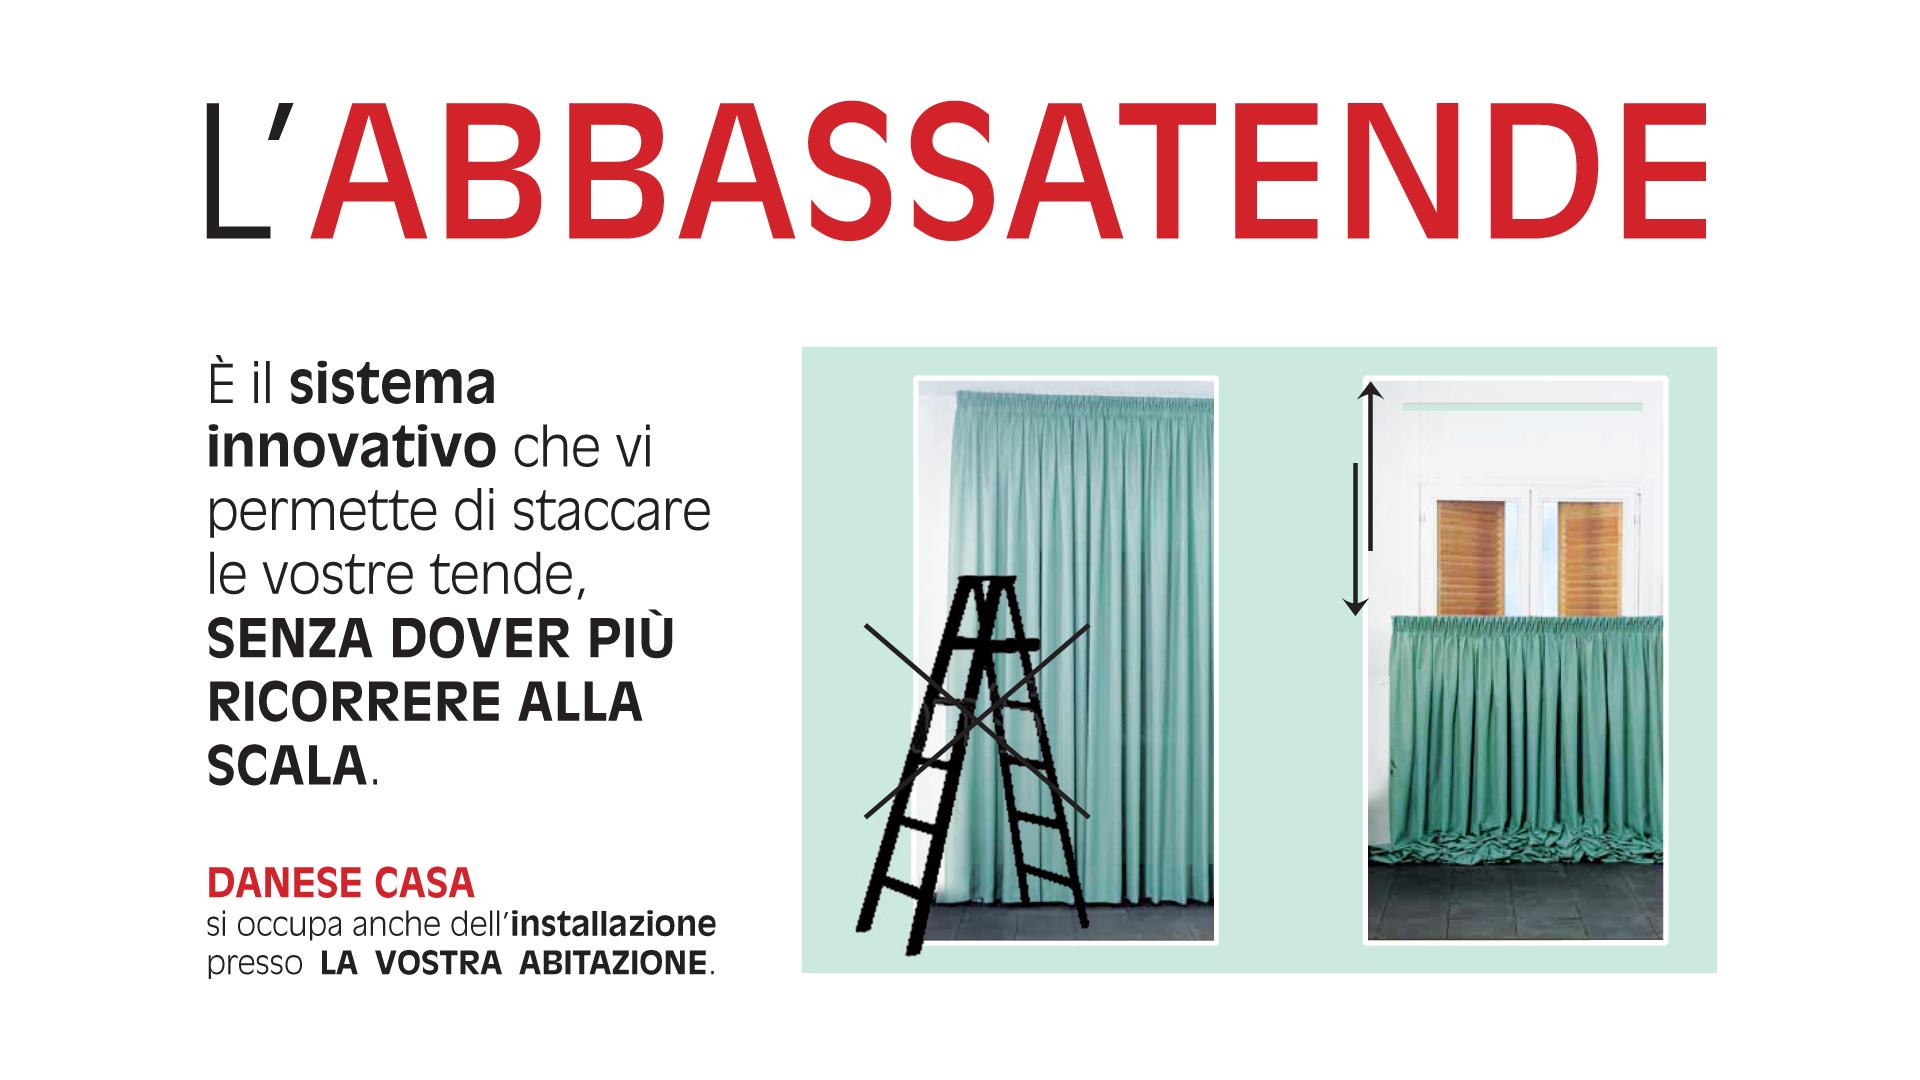 Abbassatende_HOME_www.danesecasa.com